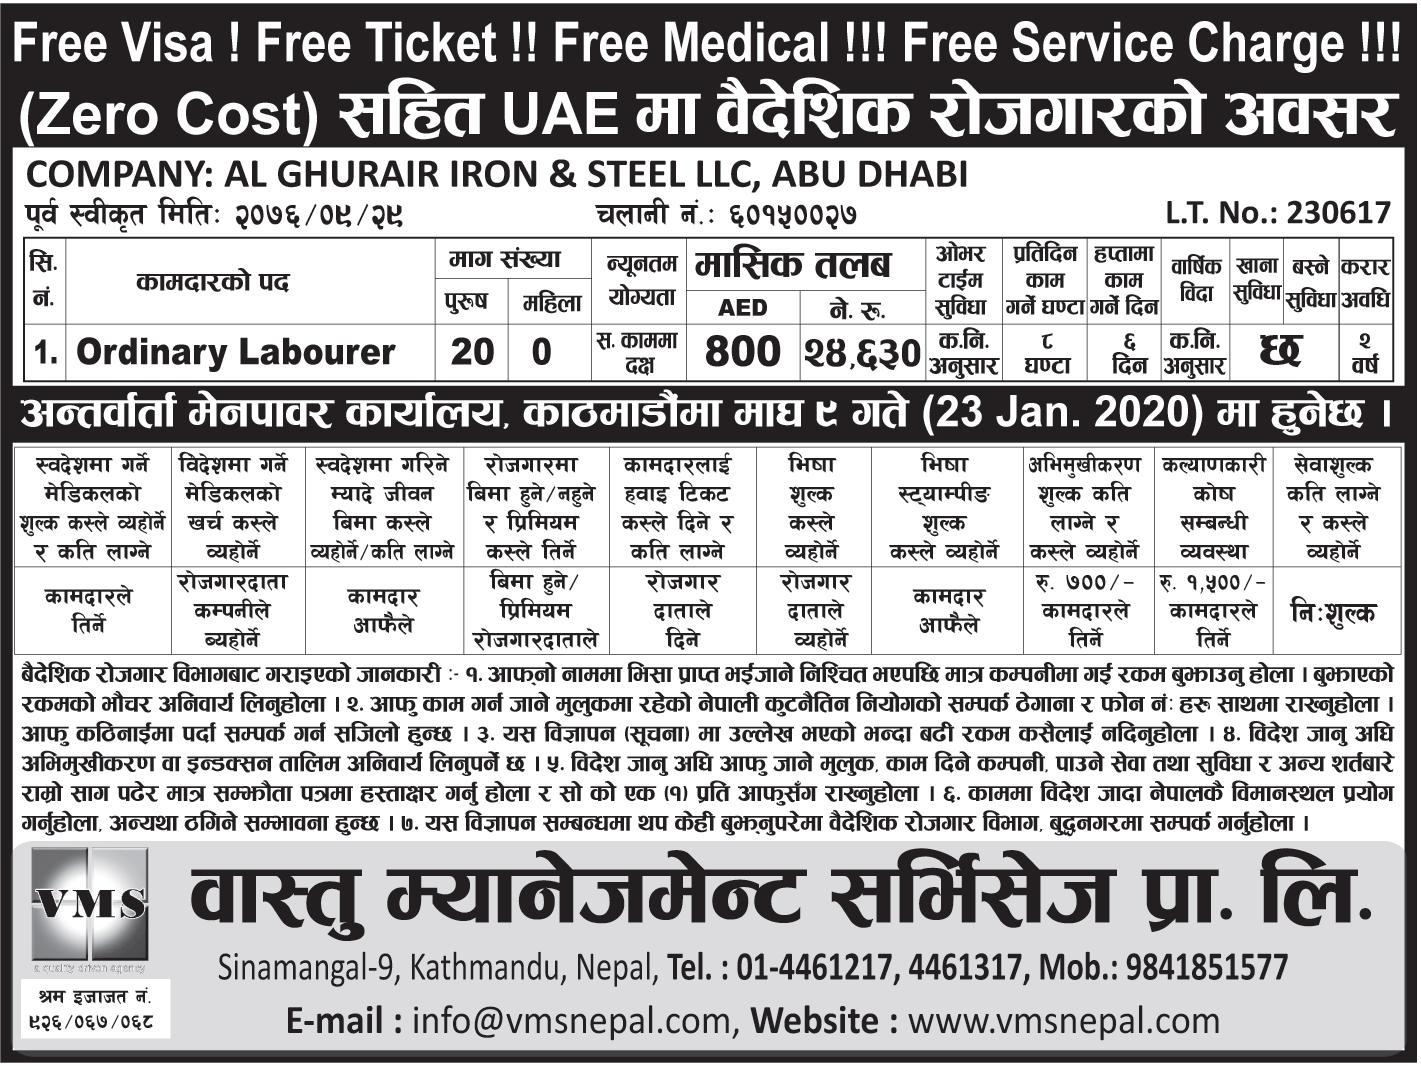 Job at al ghurair iron & steel llc abu dhabi